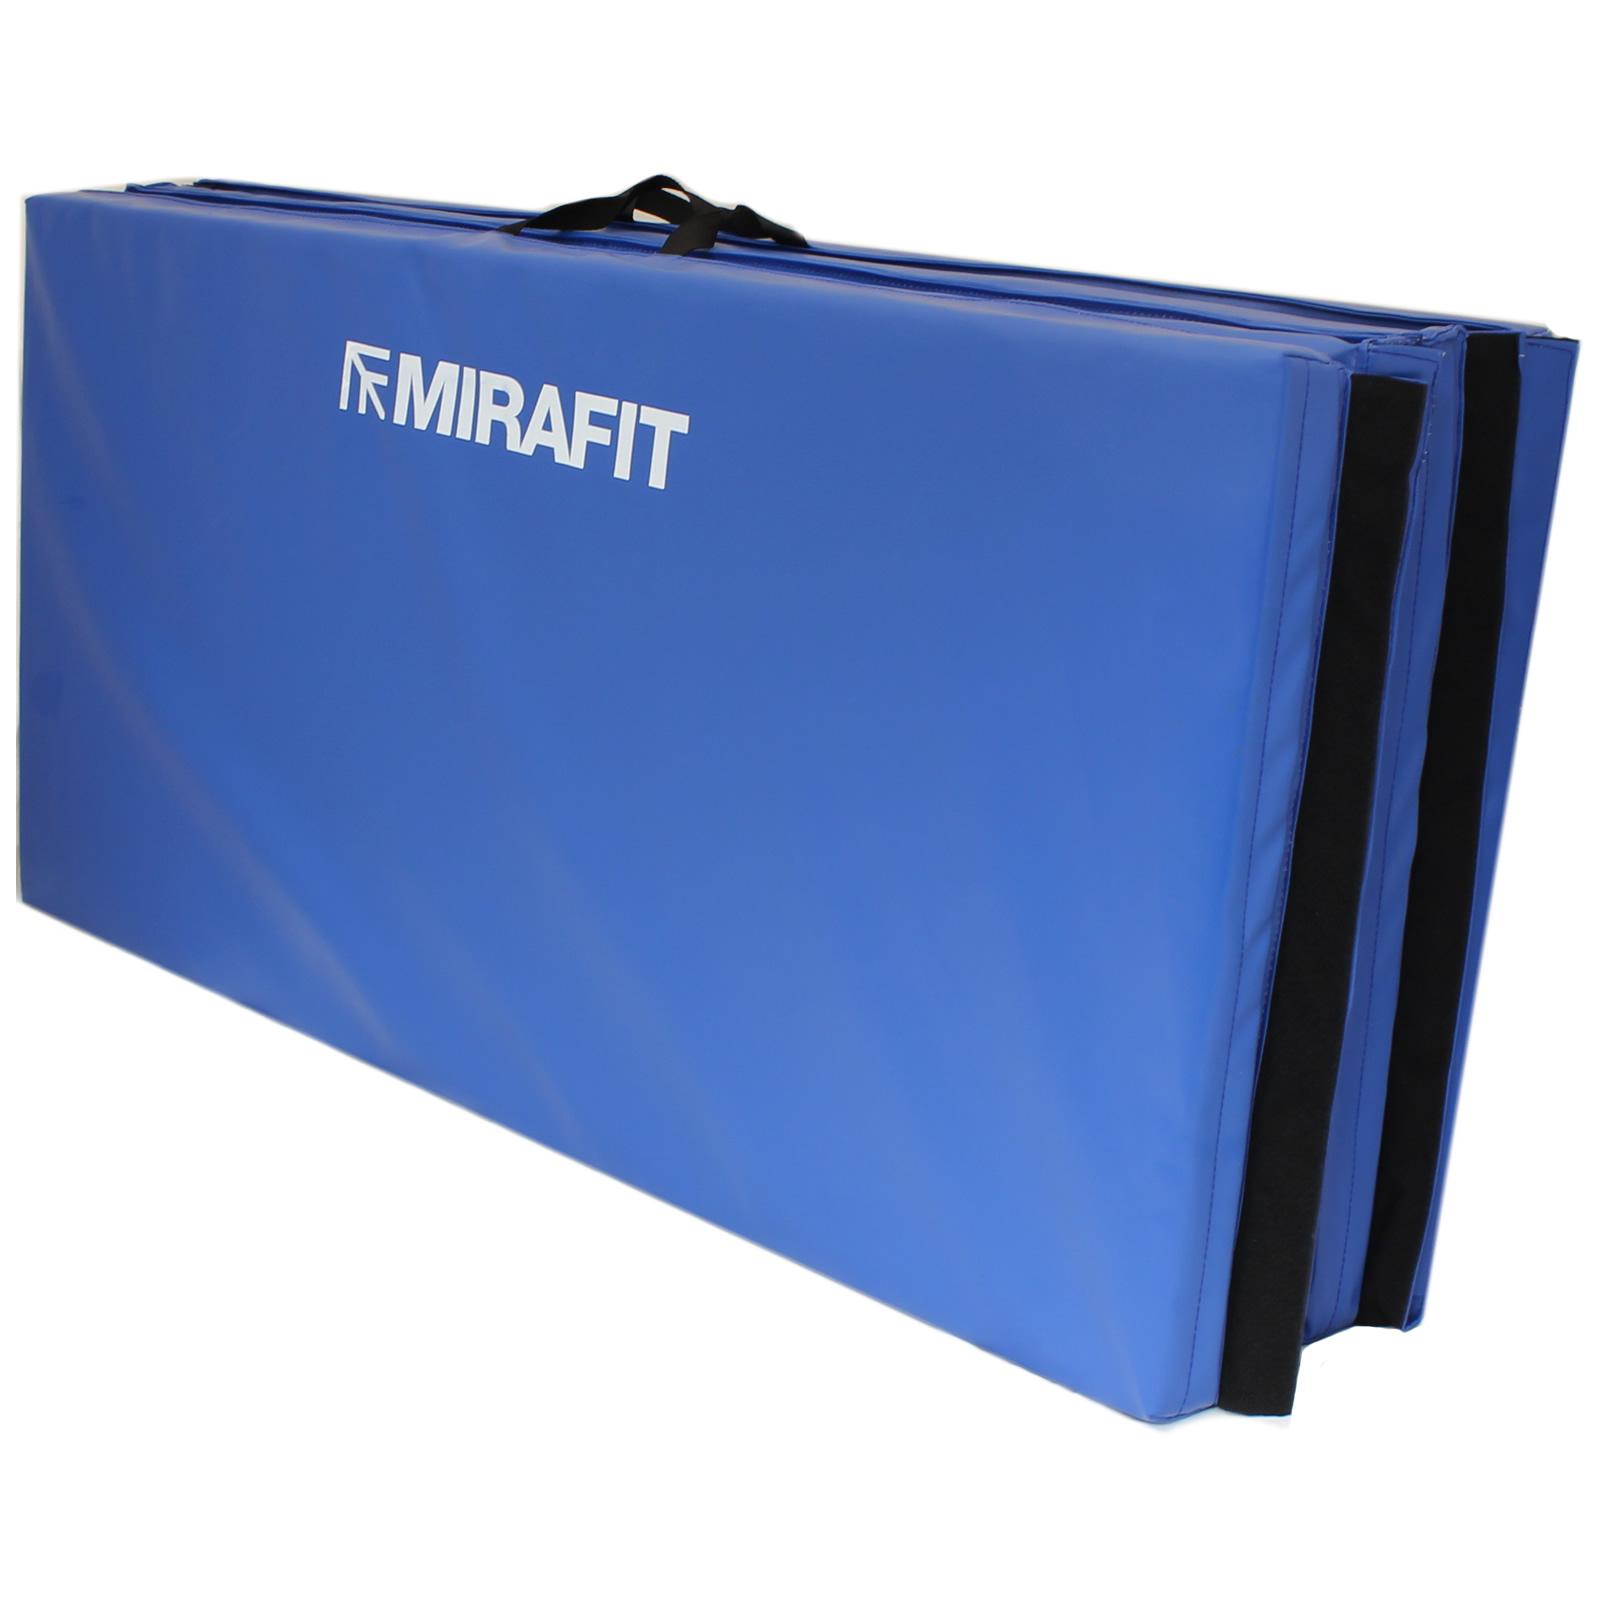 Mirafit 8ft Large Folding Exercise Gymnastics Floor Mat